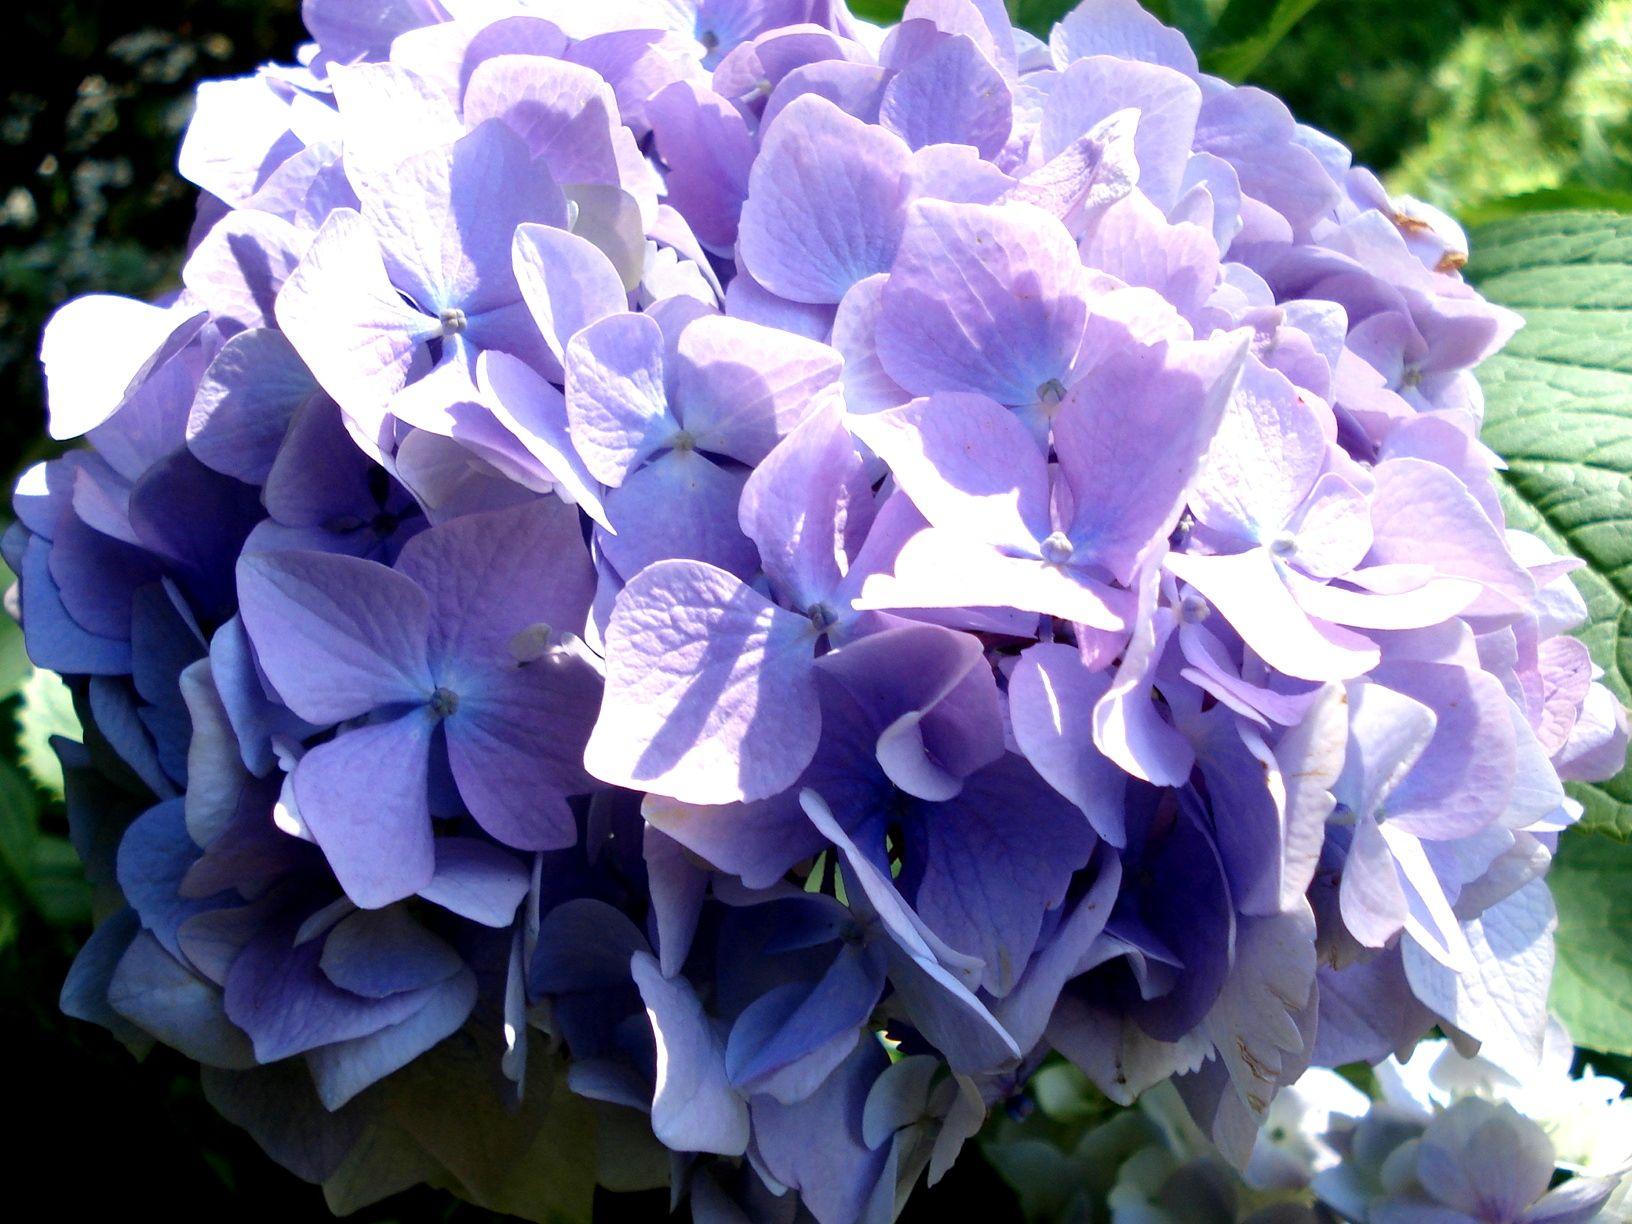 Lilac hydrangia